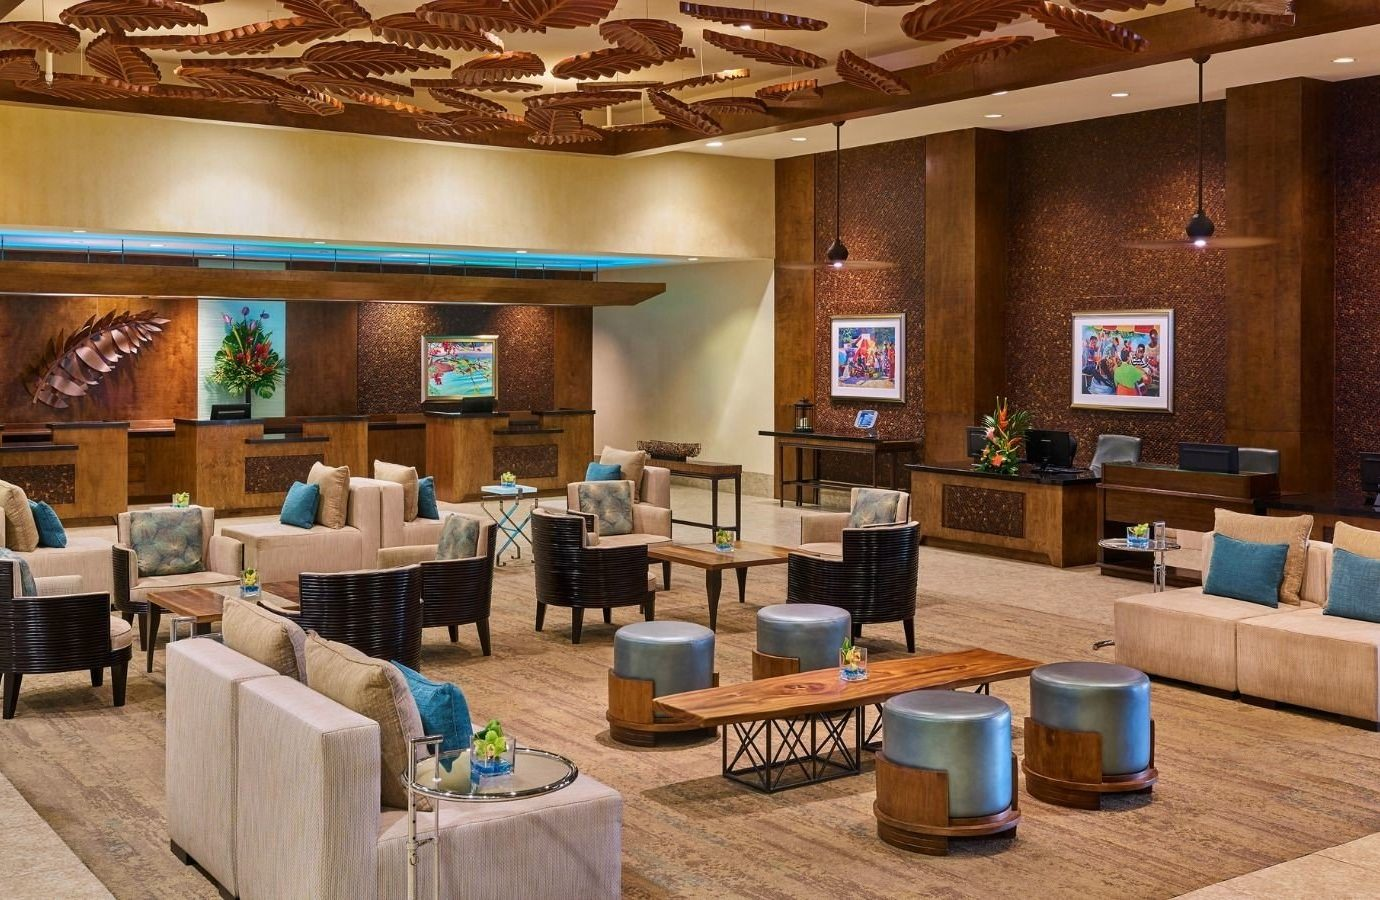 Hotels Lobby interior design restaurant furniture